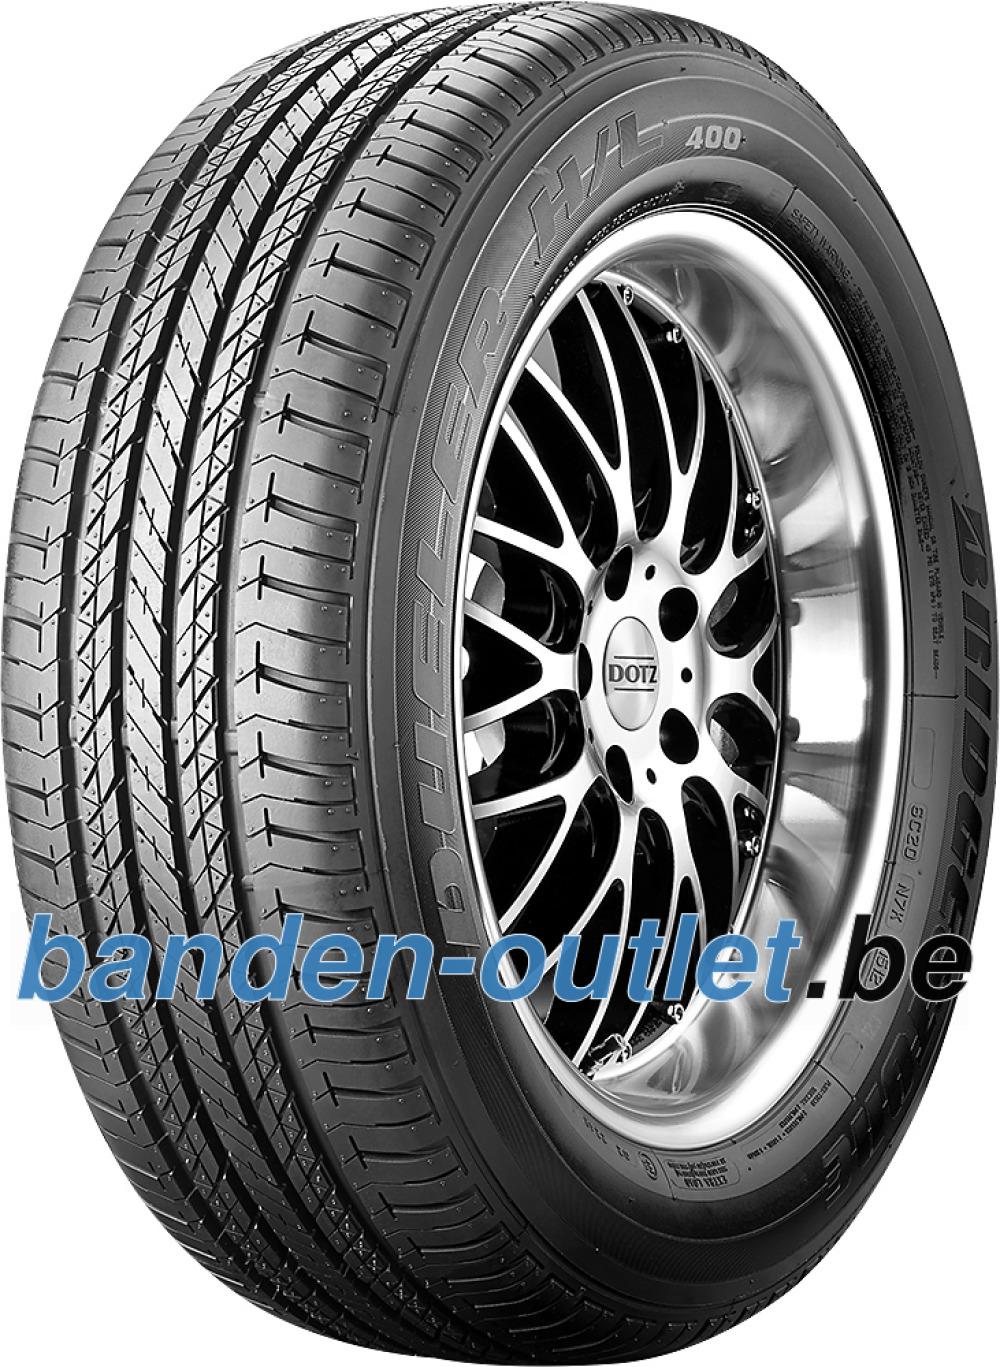 Bridgestone Dueler H/L 400 RFT ( 255/50 R19 107H XL *, met velgrandbescherming (MFS), runflat )